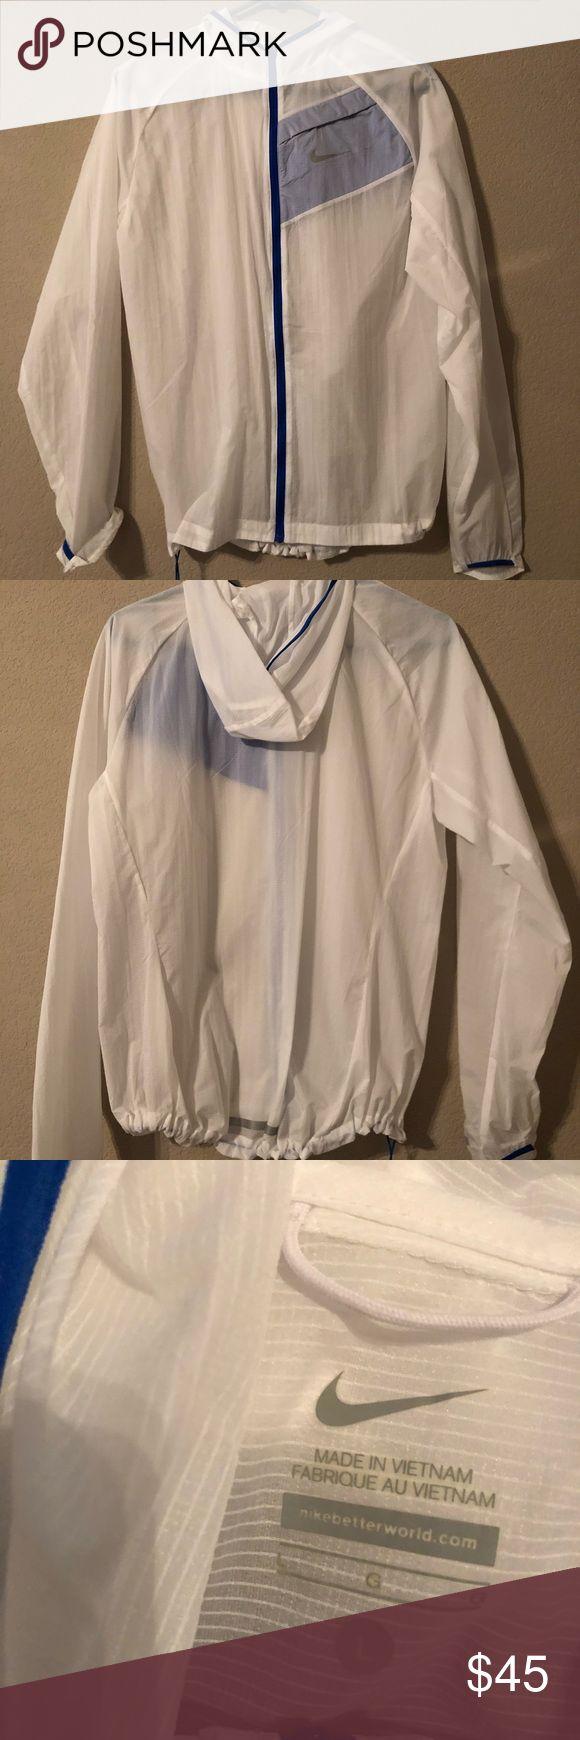 Women's NIKE Windrunner Never worn- NWOT Slightly see through Nike Jackets & Coats Utility Jackets